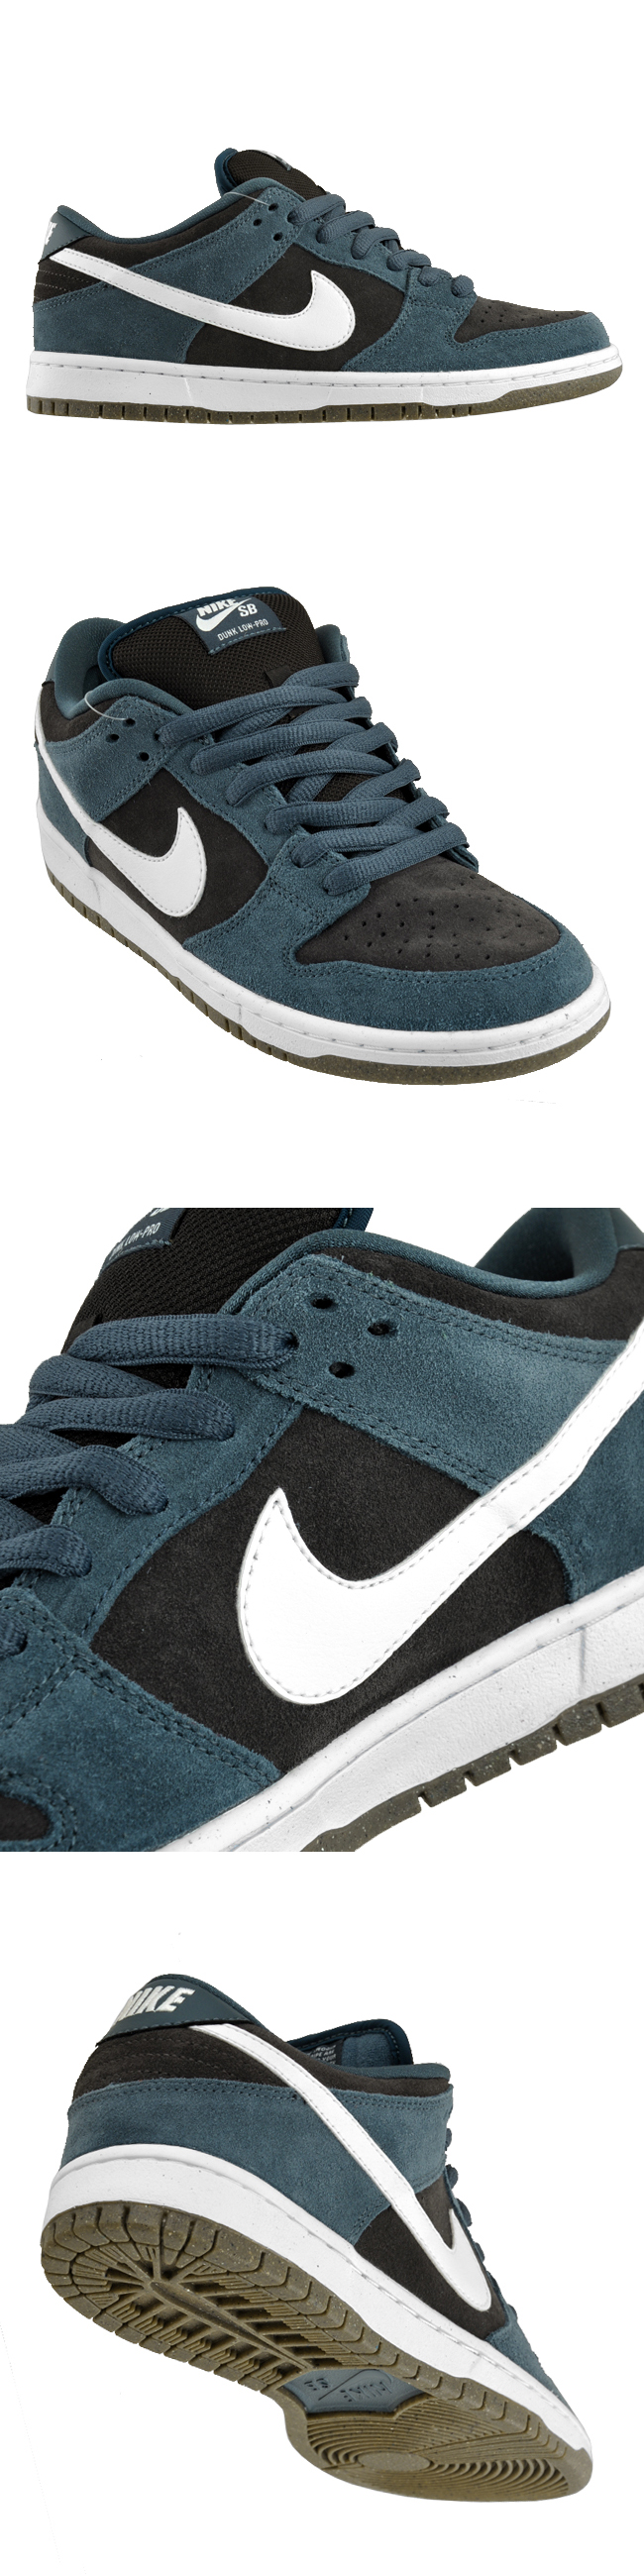 Nike SB Dunk Low 'Slate Blue'